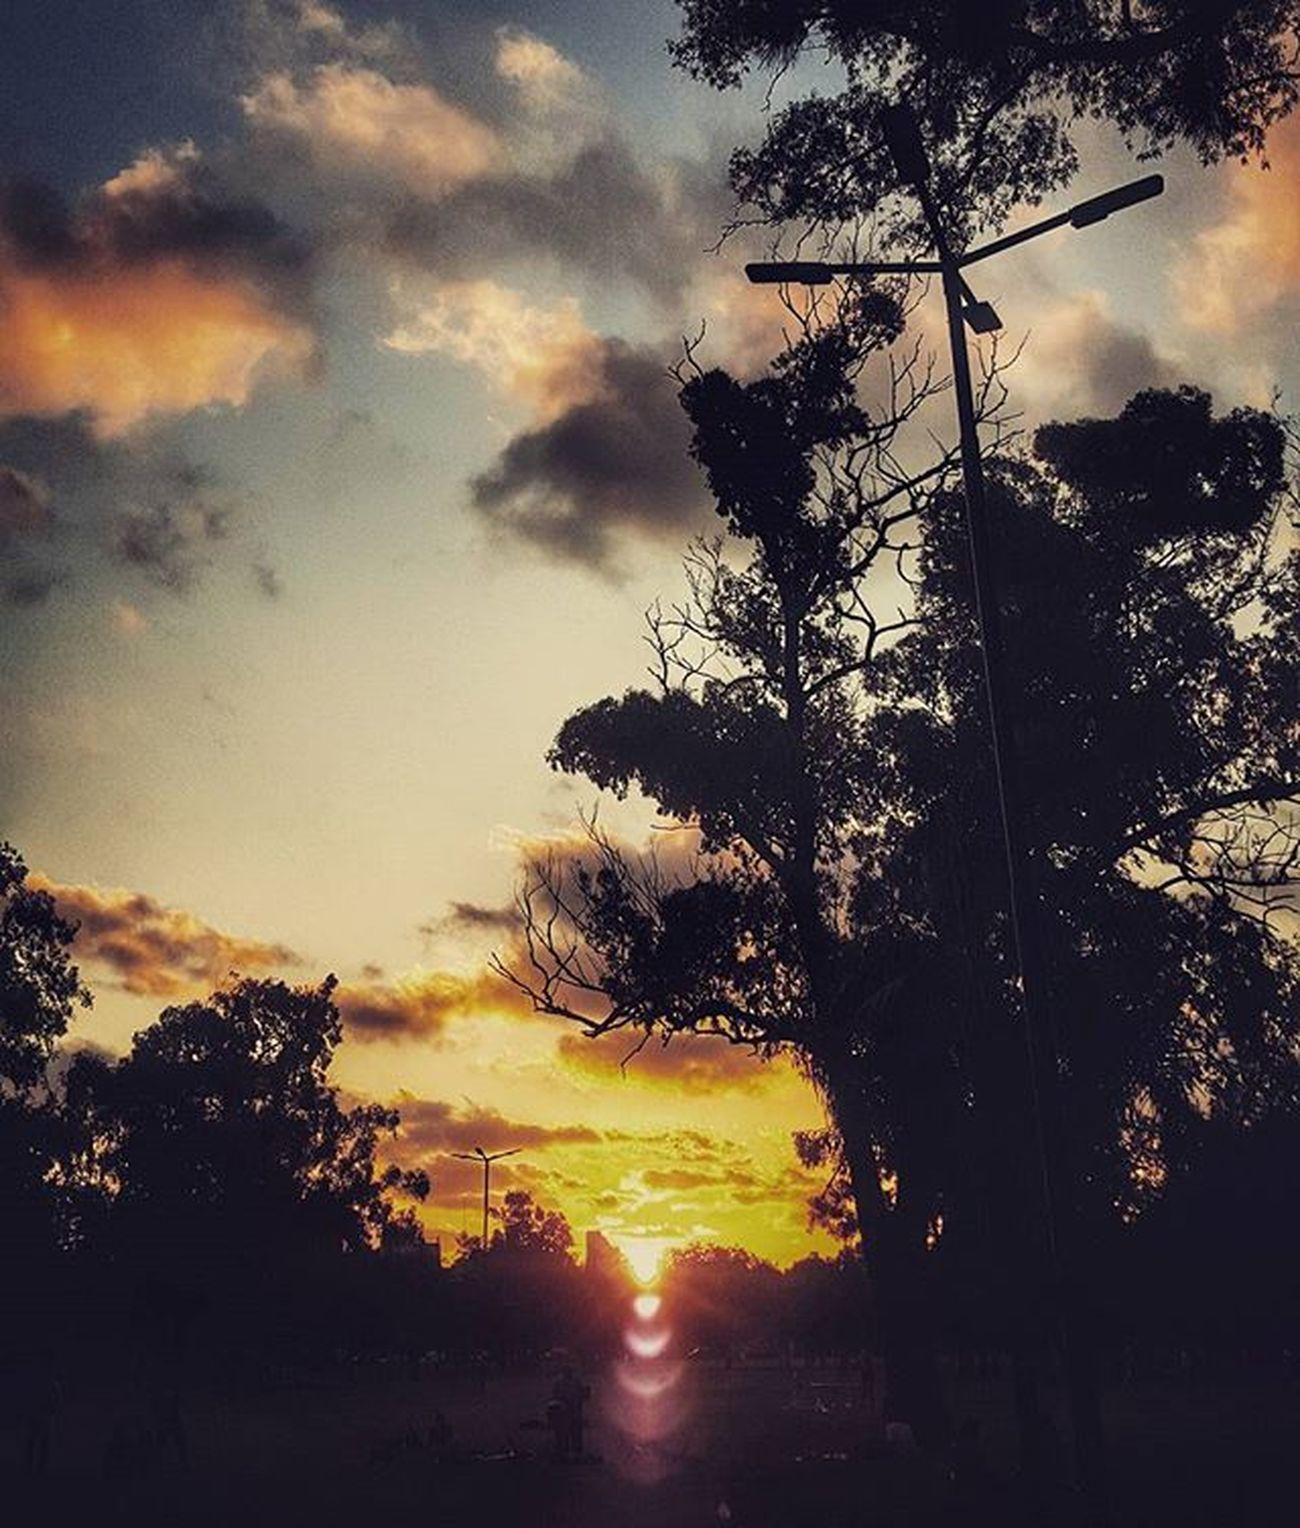 Buen domingo para tod@s! Trees Contrast Siluette Instamoment Instadaily Picoftheday Sundown Atardecer Mirror Belgrano Naturelovers Igersargentina Igcapturesclub Igbuenosaires Ig_buenosaires Ig_captures Argentina_estrella Bestsunsets World_bestsunset Sunsetporn Sunset_ig Goldensky Nubesdetuciudad Cloudporn Worldbestsunsets